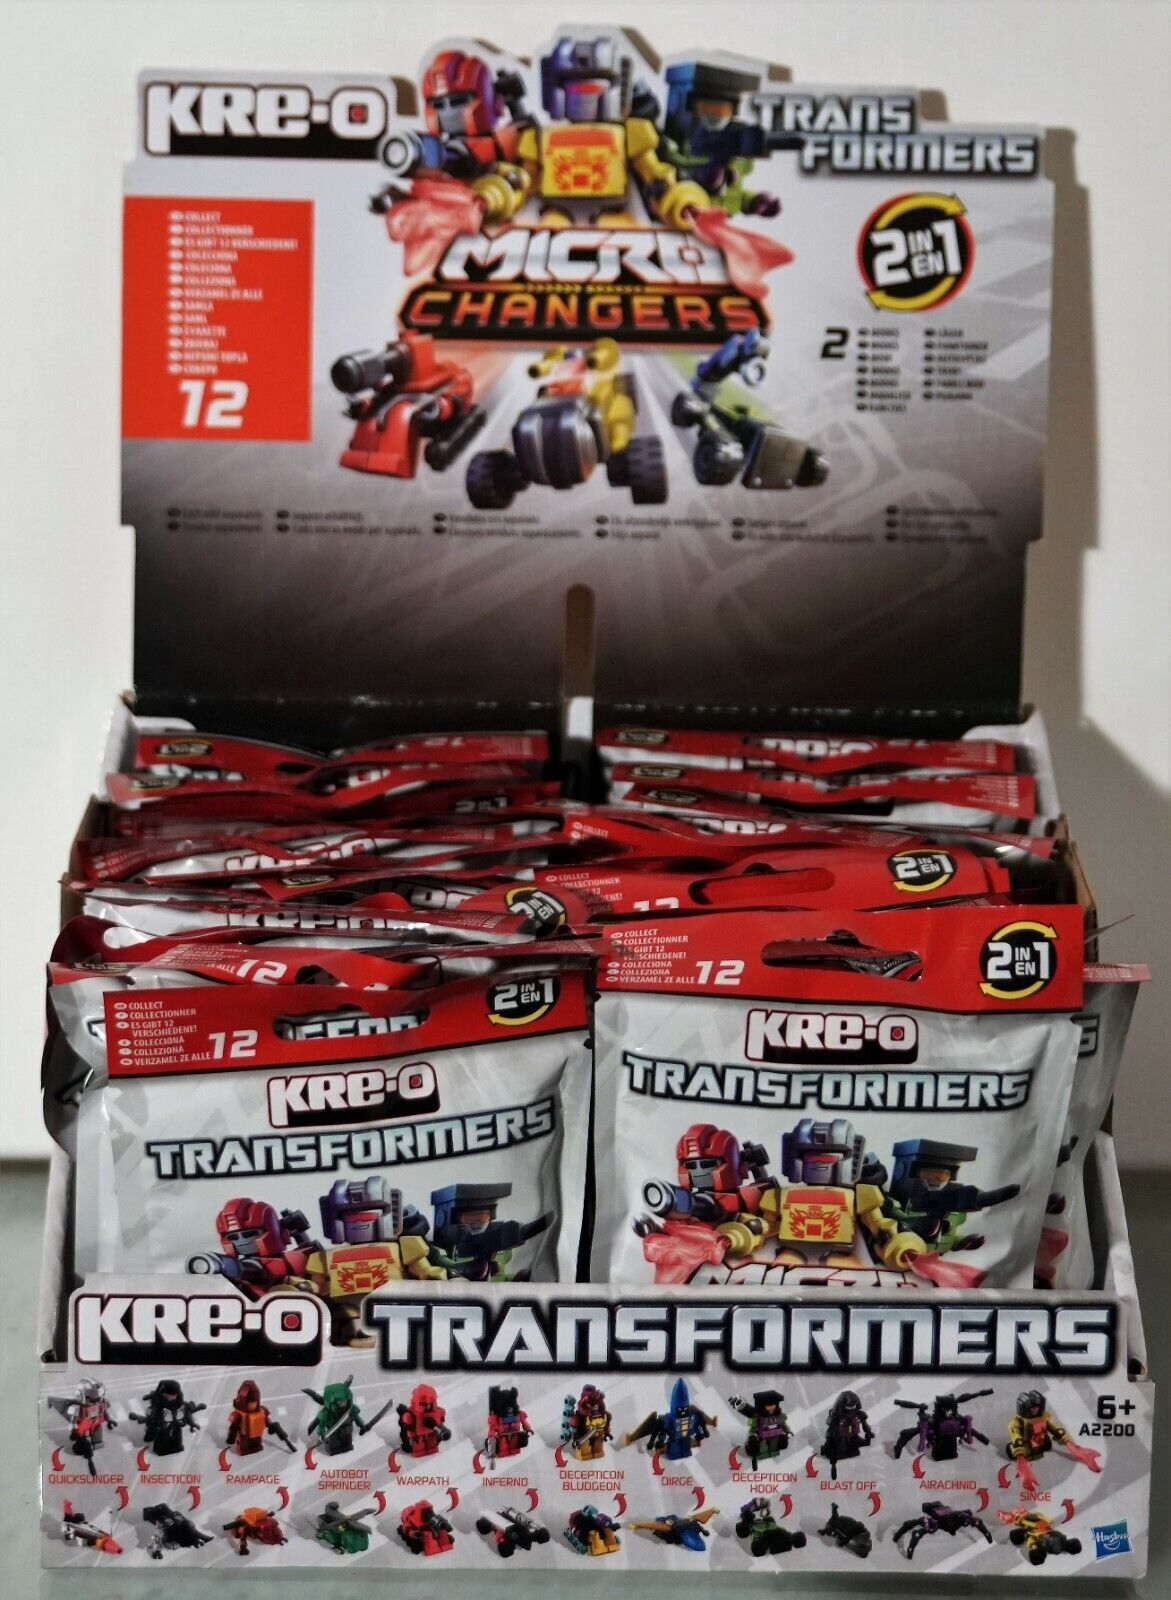 KRE-O Transformers-Beast Micro Changers Blind Bag Set 1 Satz Set = 12 Fig. Kreo